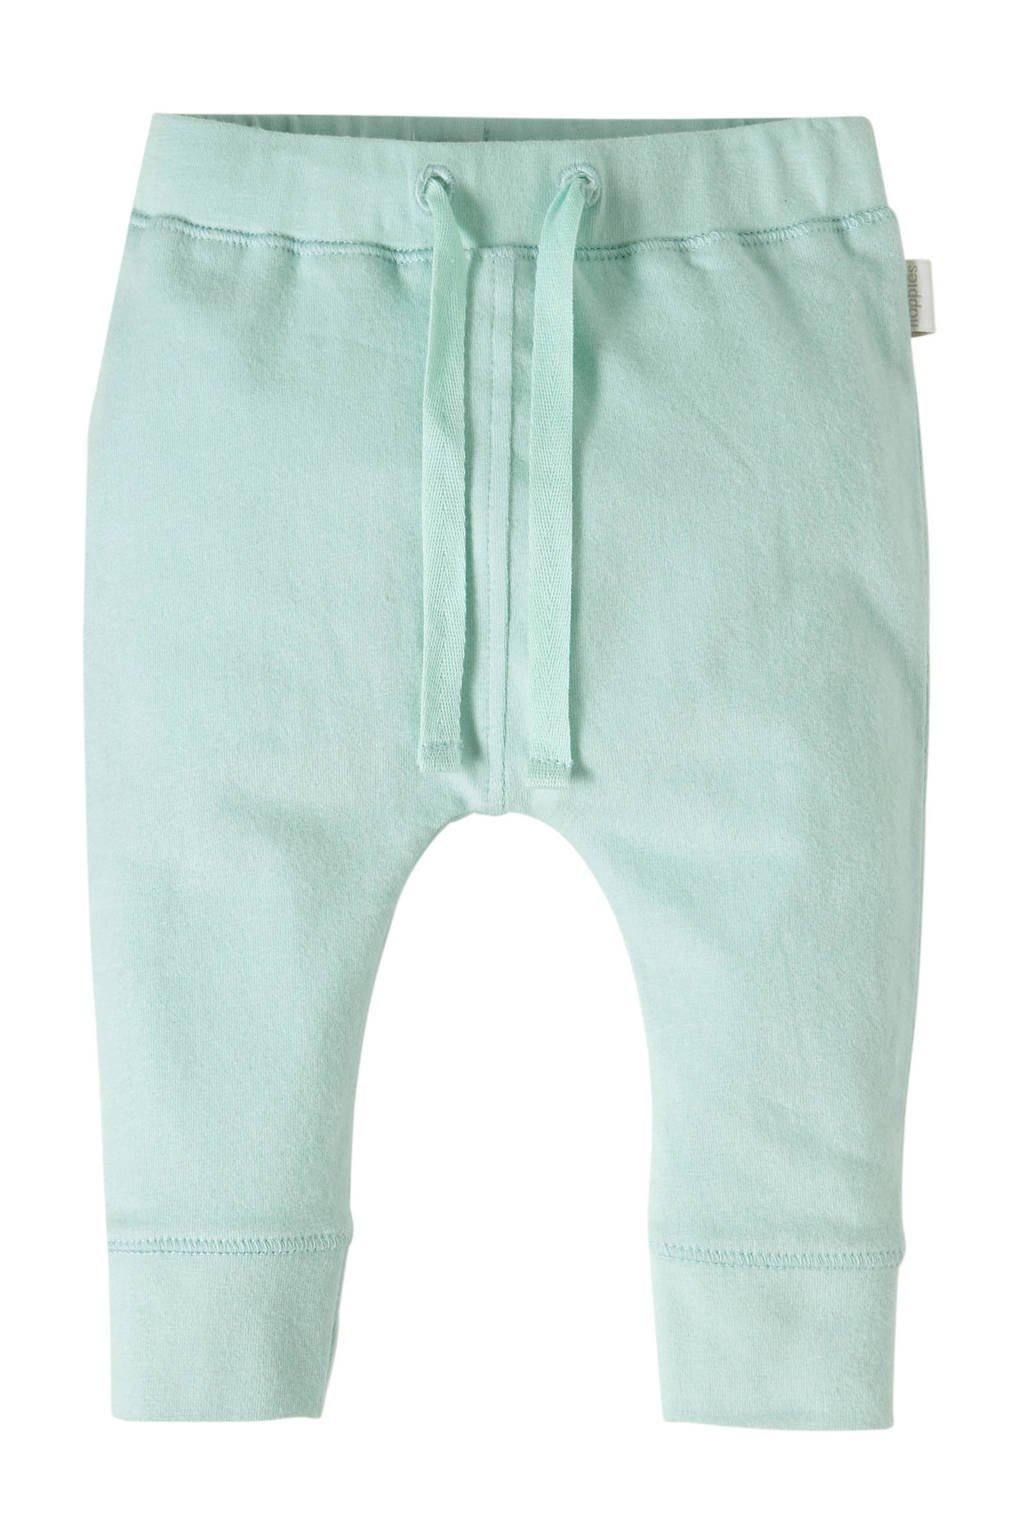 Noppies baby broek Palm Coast, Pastel turquoise